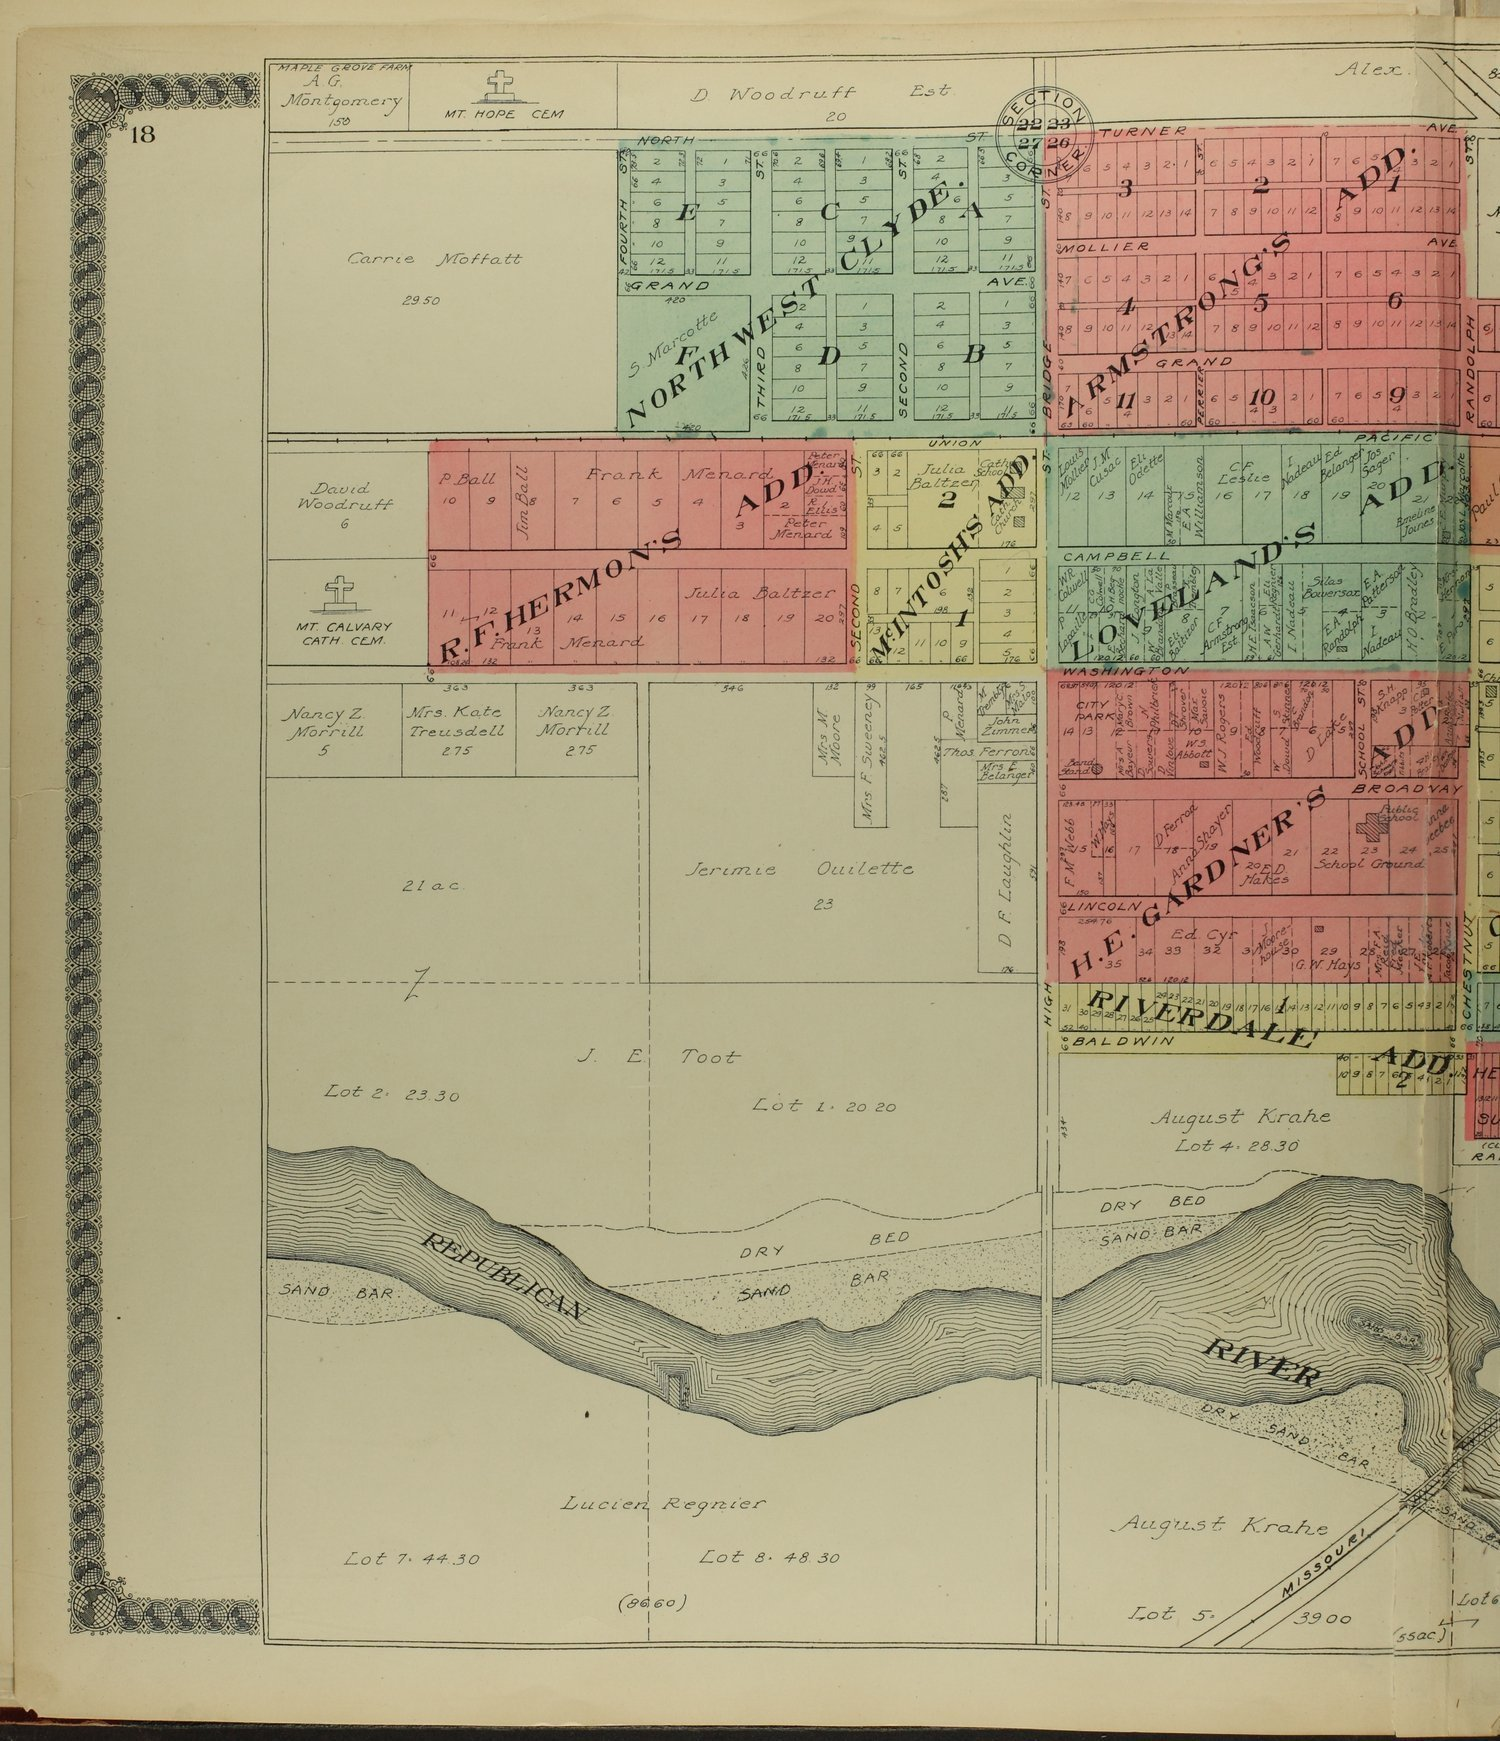 Standard atlas of Cloud County, Kansas - 18